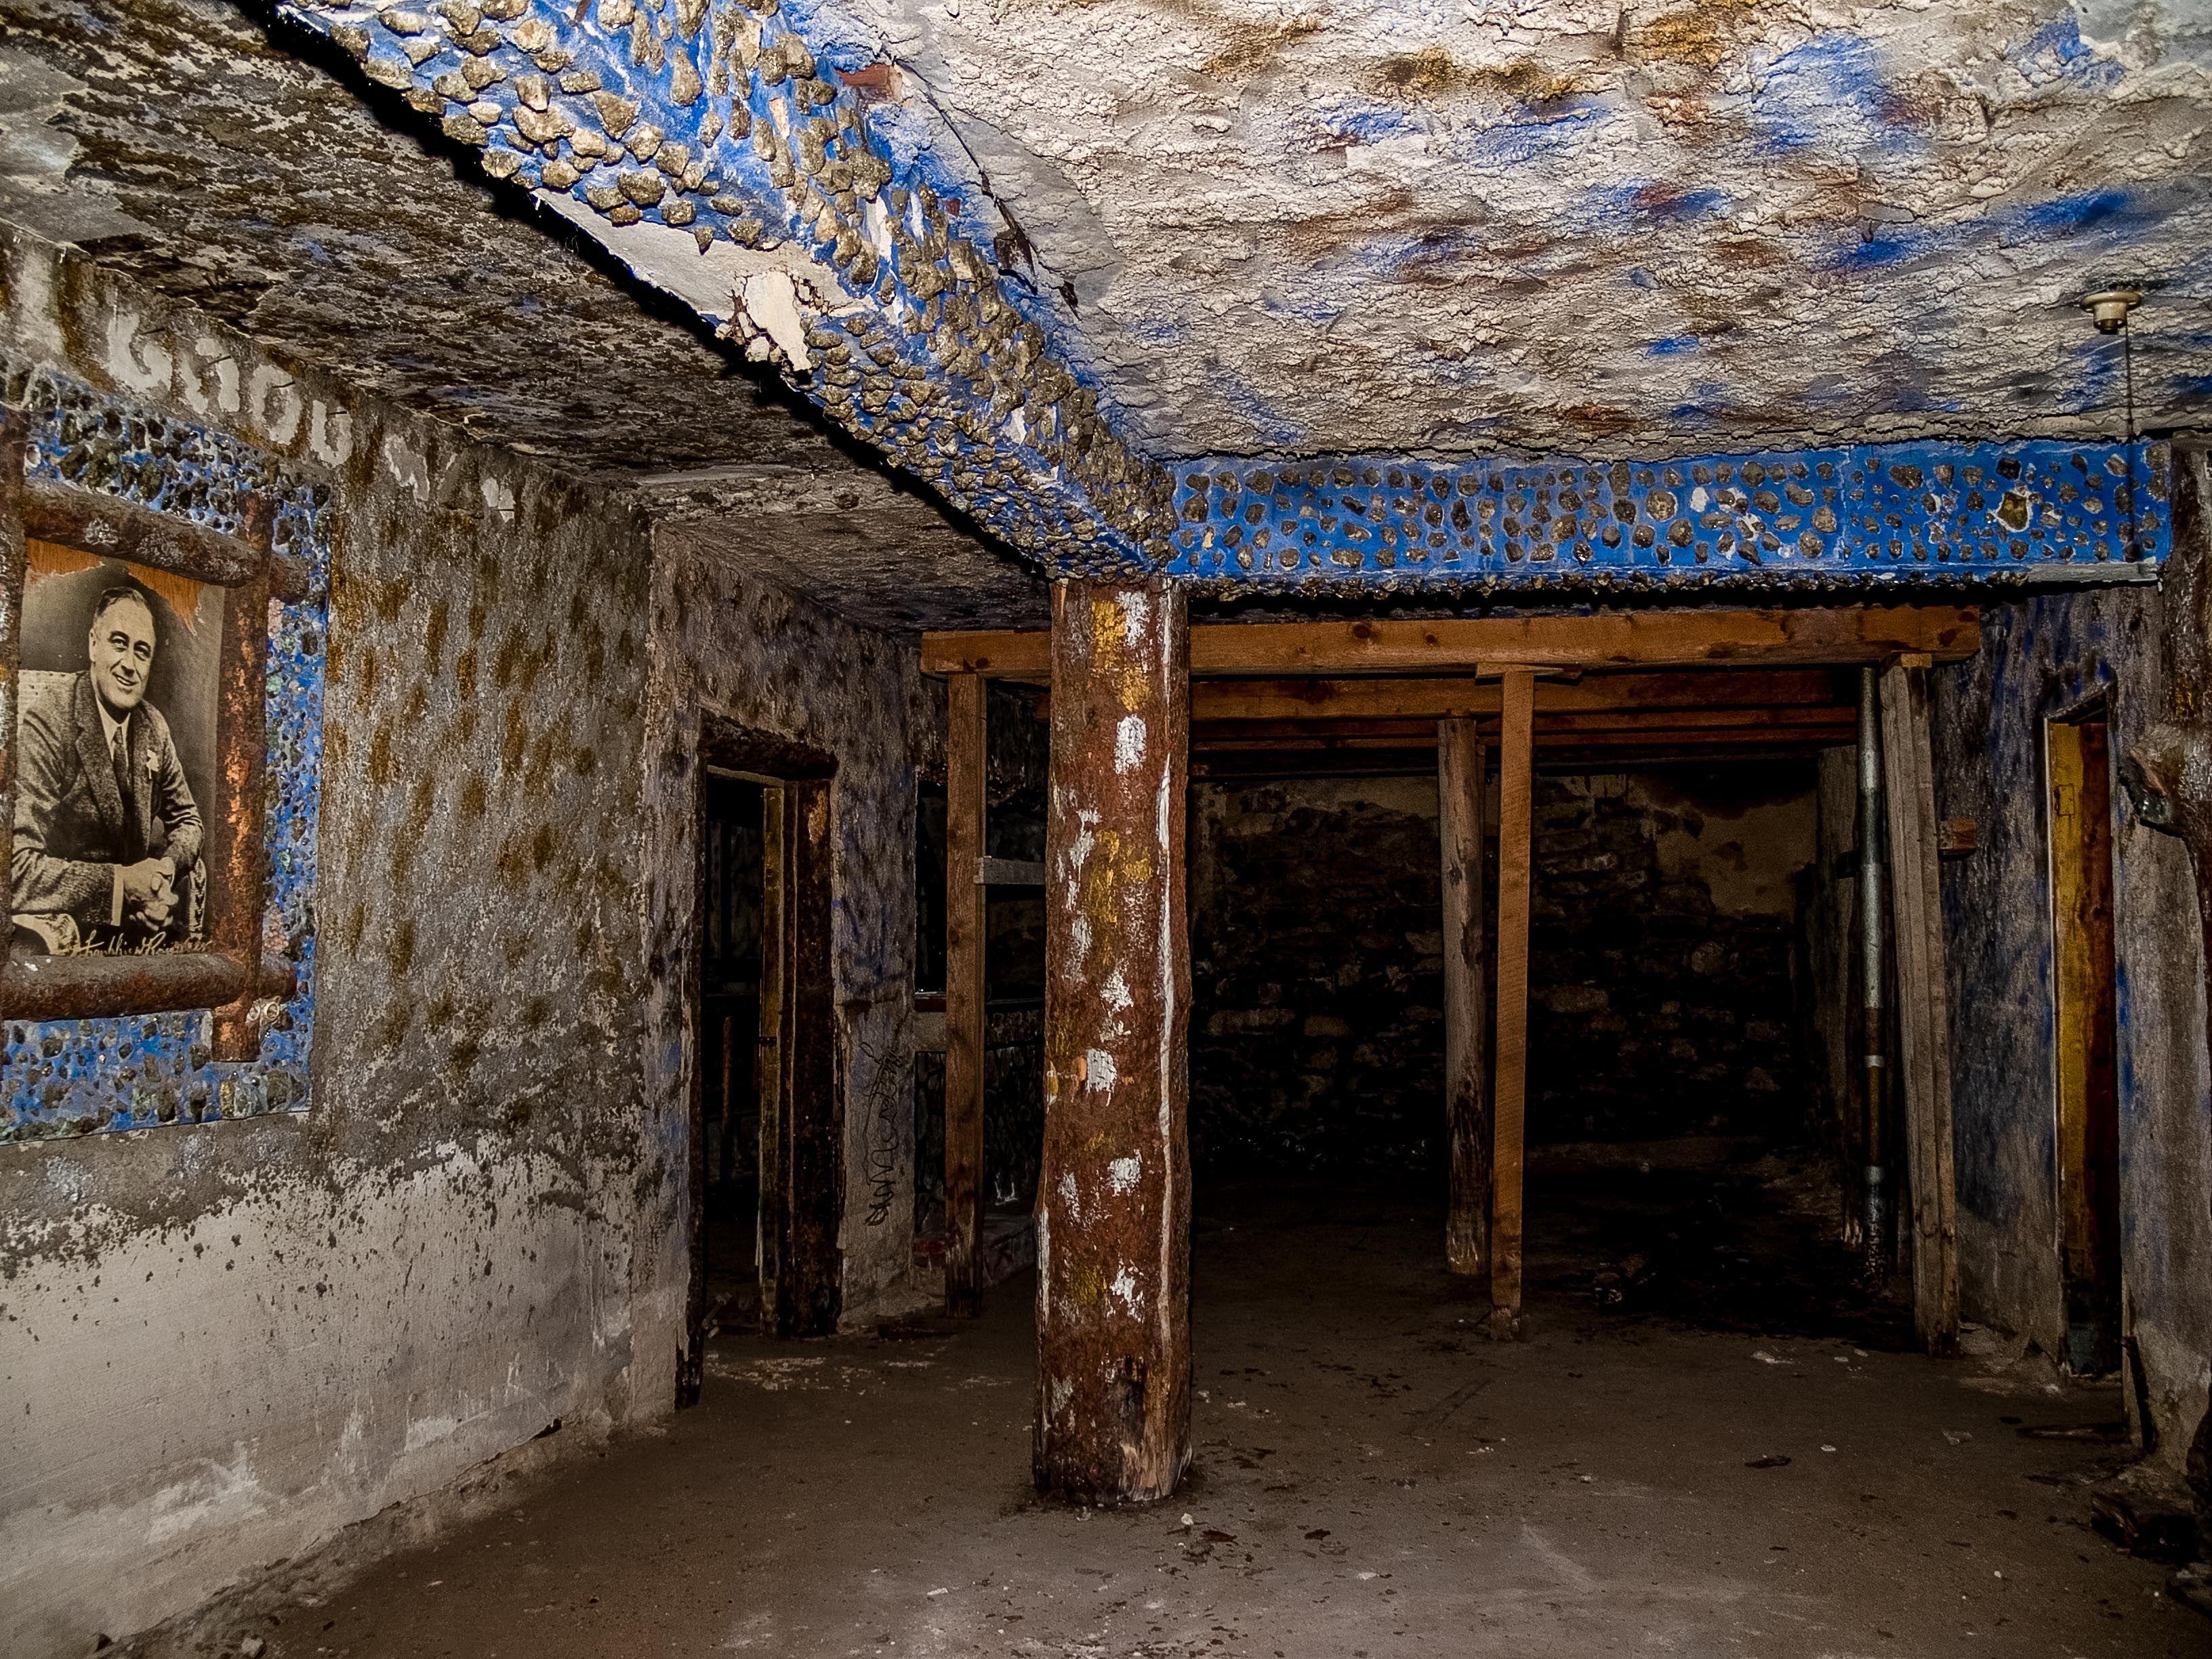 Prescott Underground Tunnels (Williams: transporting